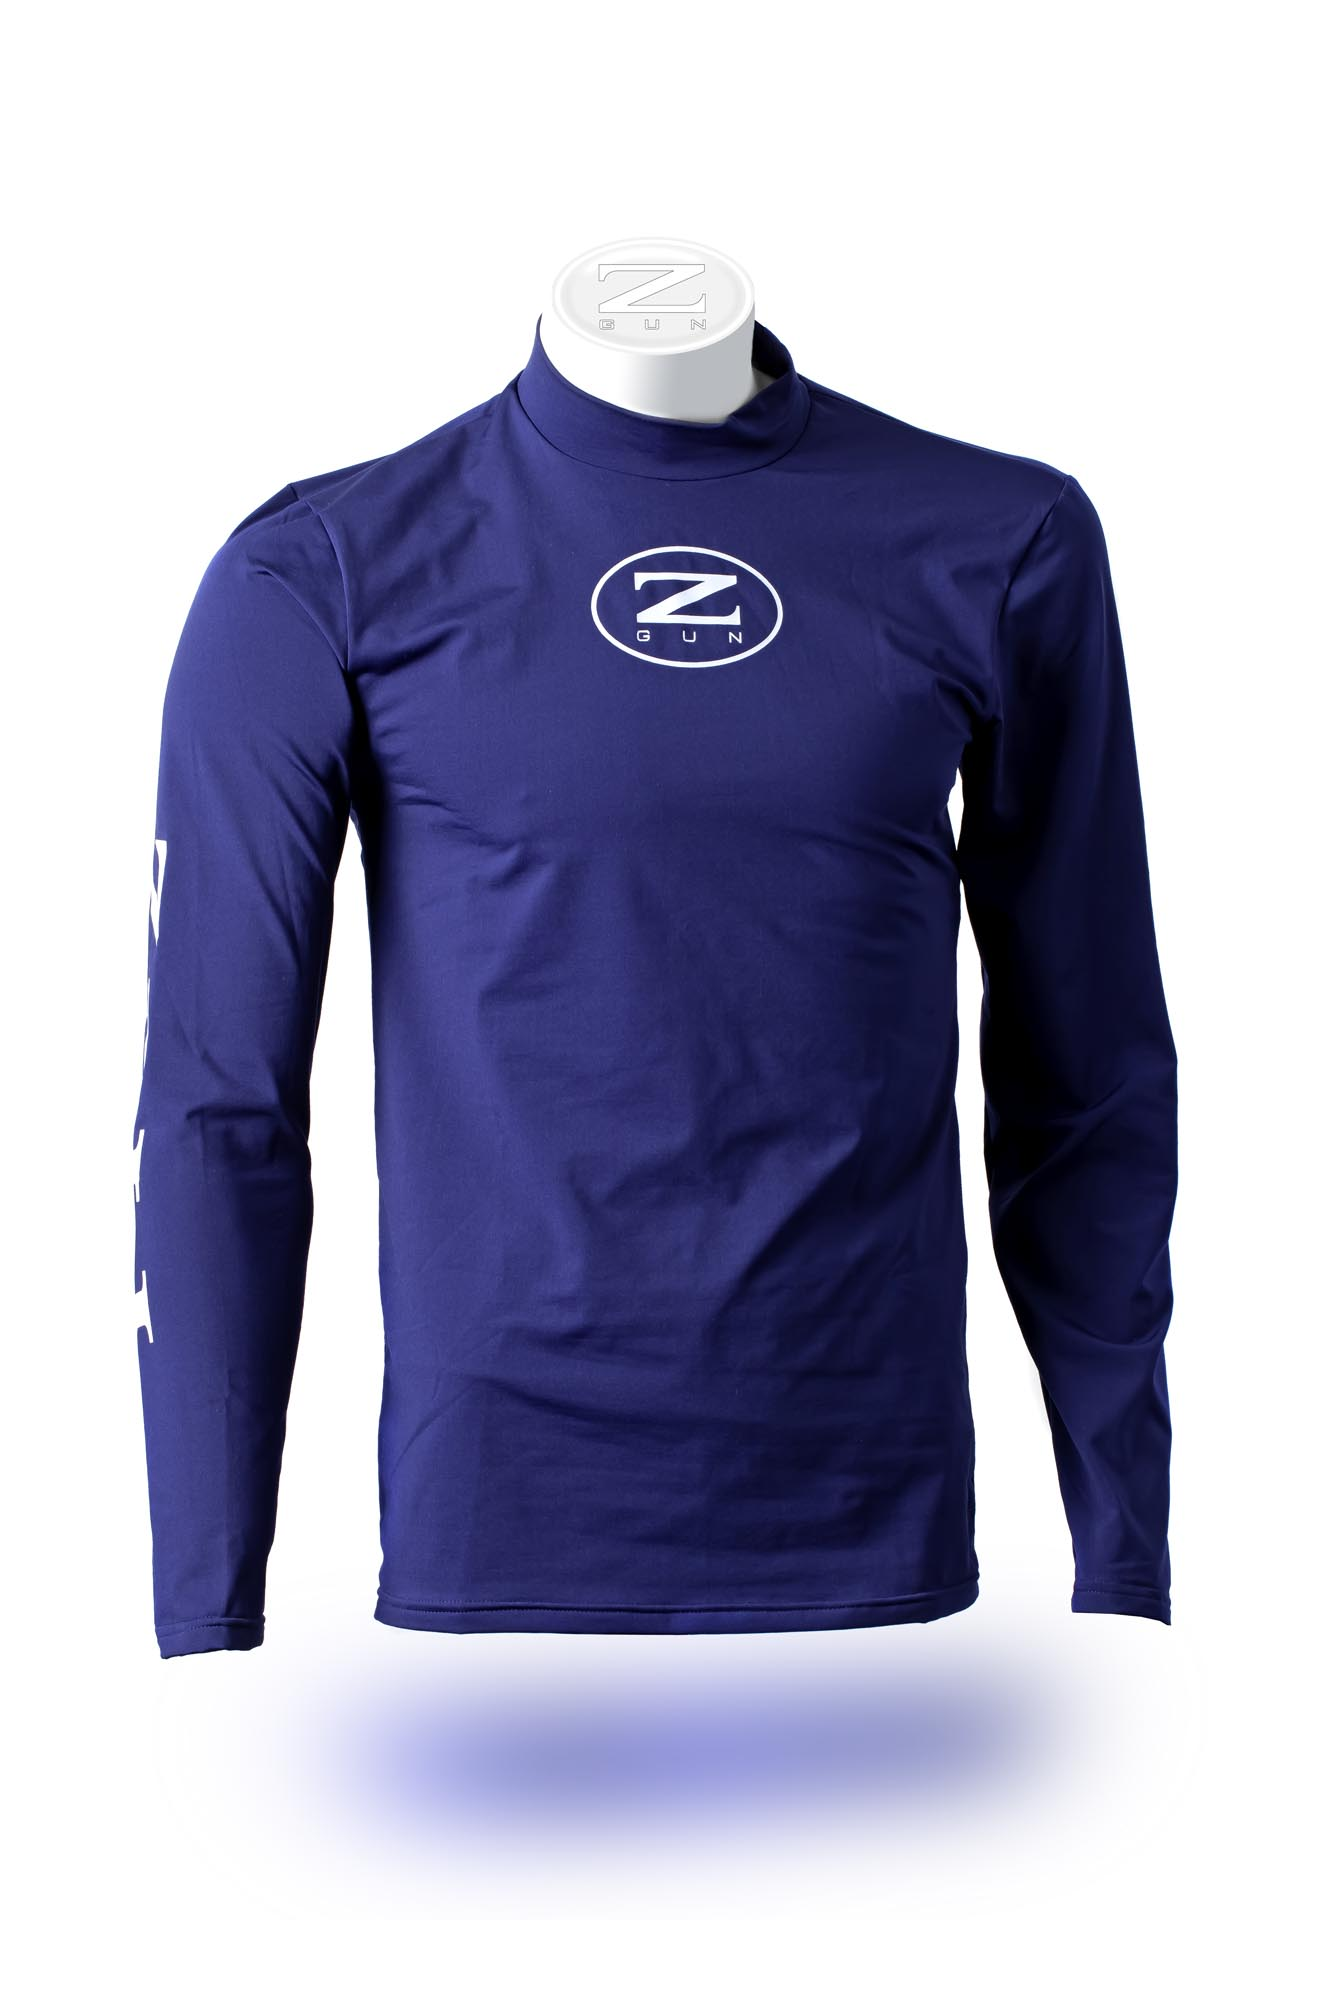 ZOLI Long Sleeve T-Shirt Blue